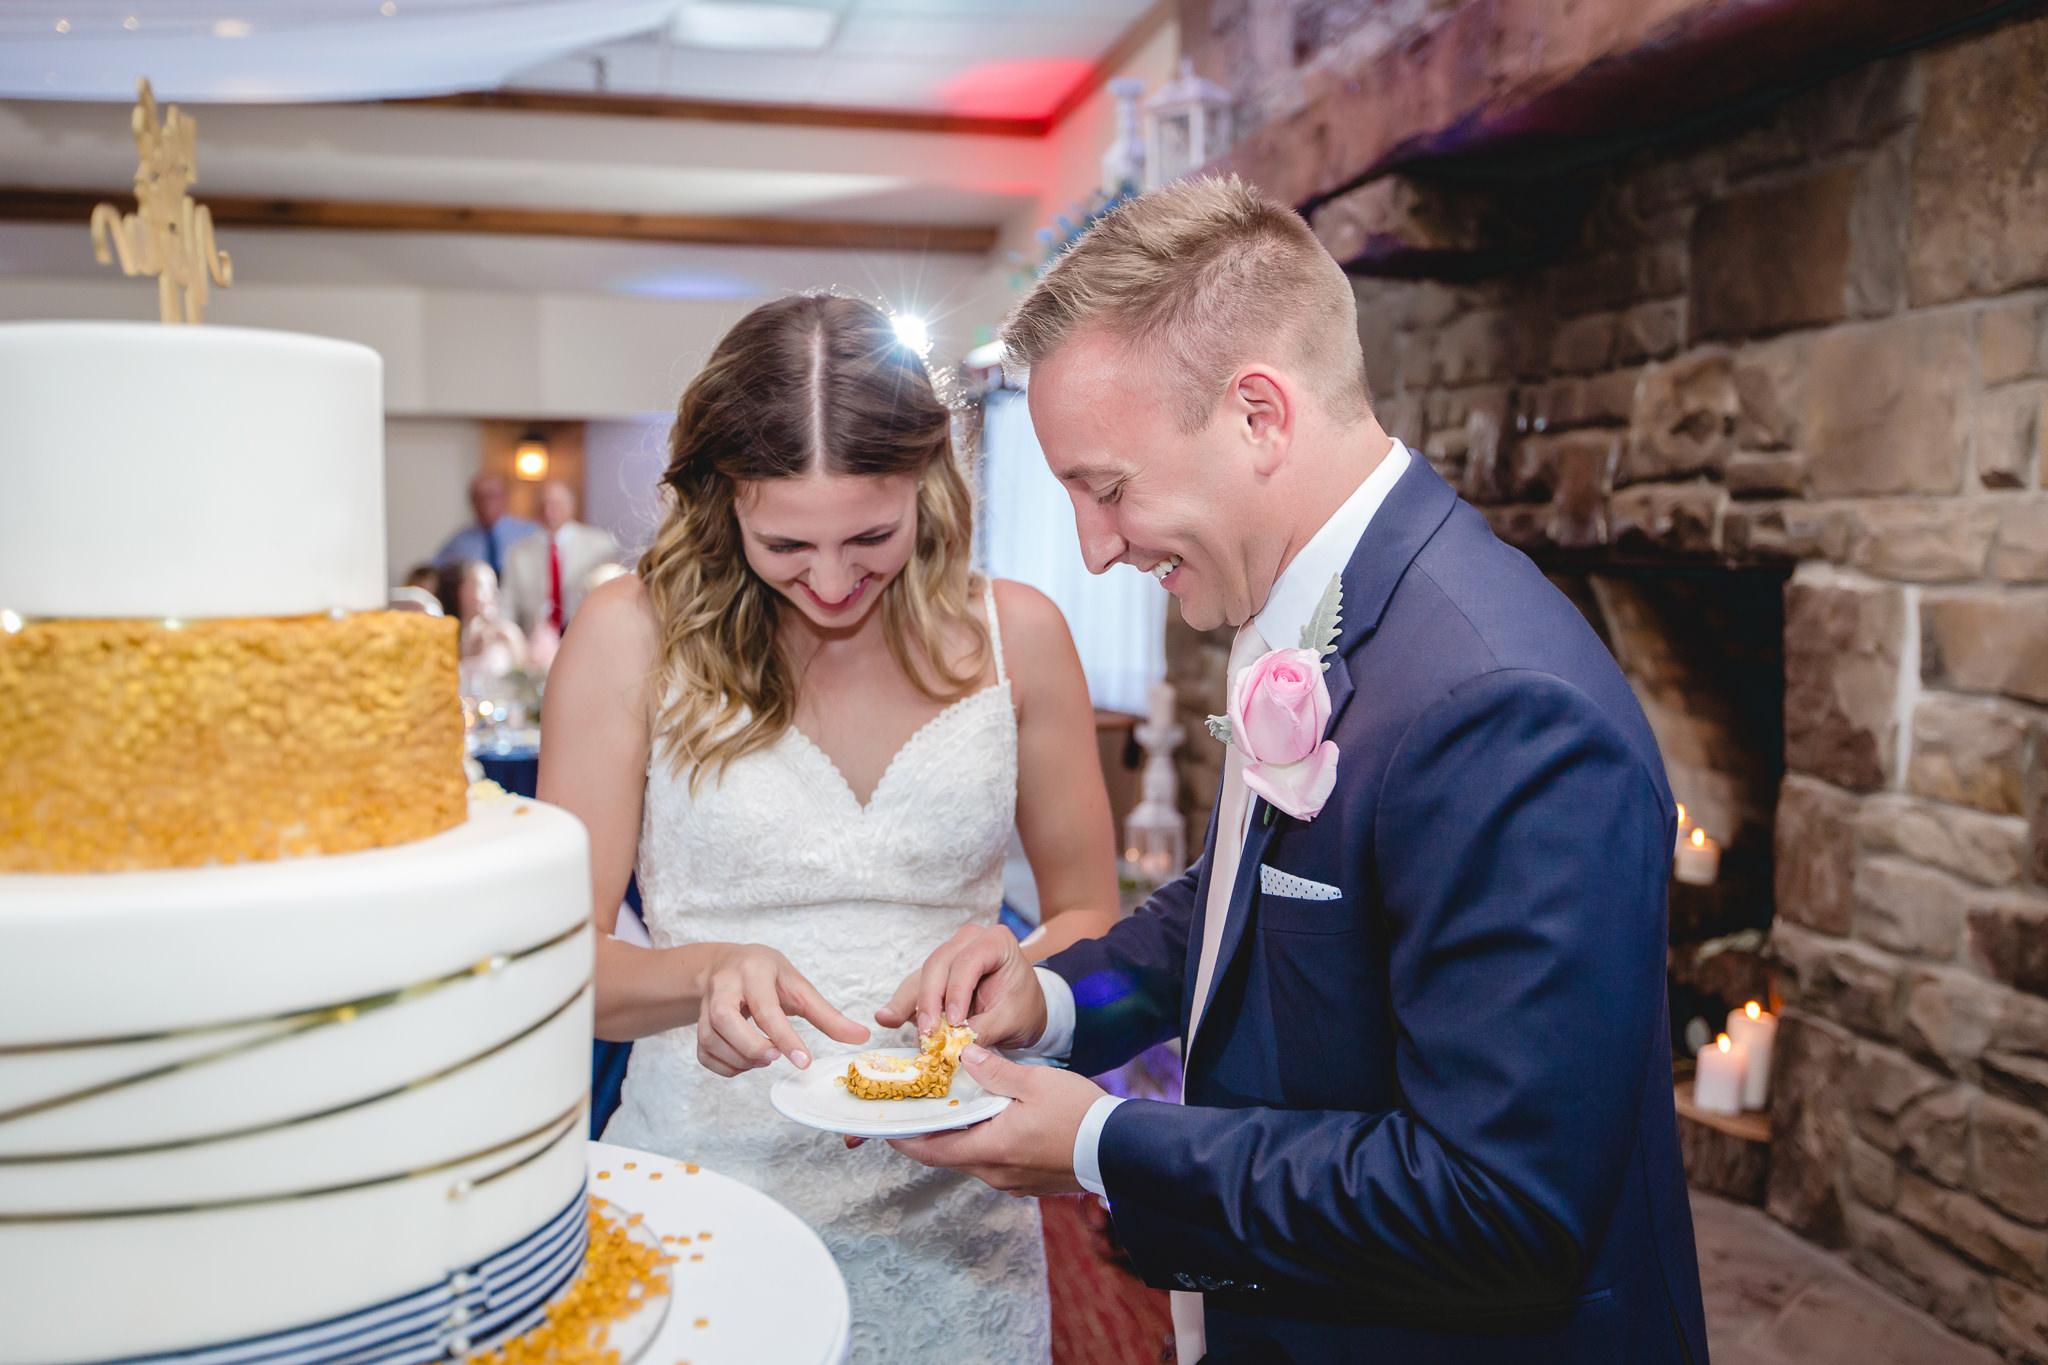 Newlyweds laugh during cake cutting at Hidden Valley Resort wedding reception